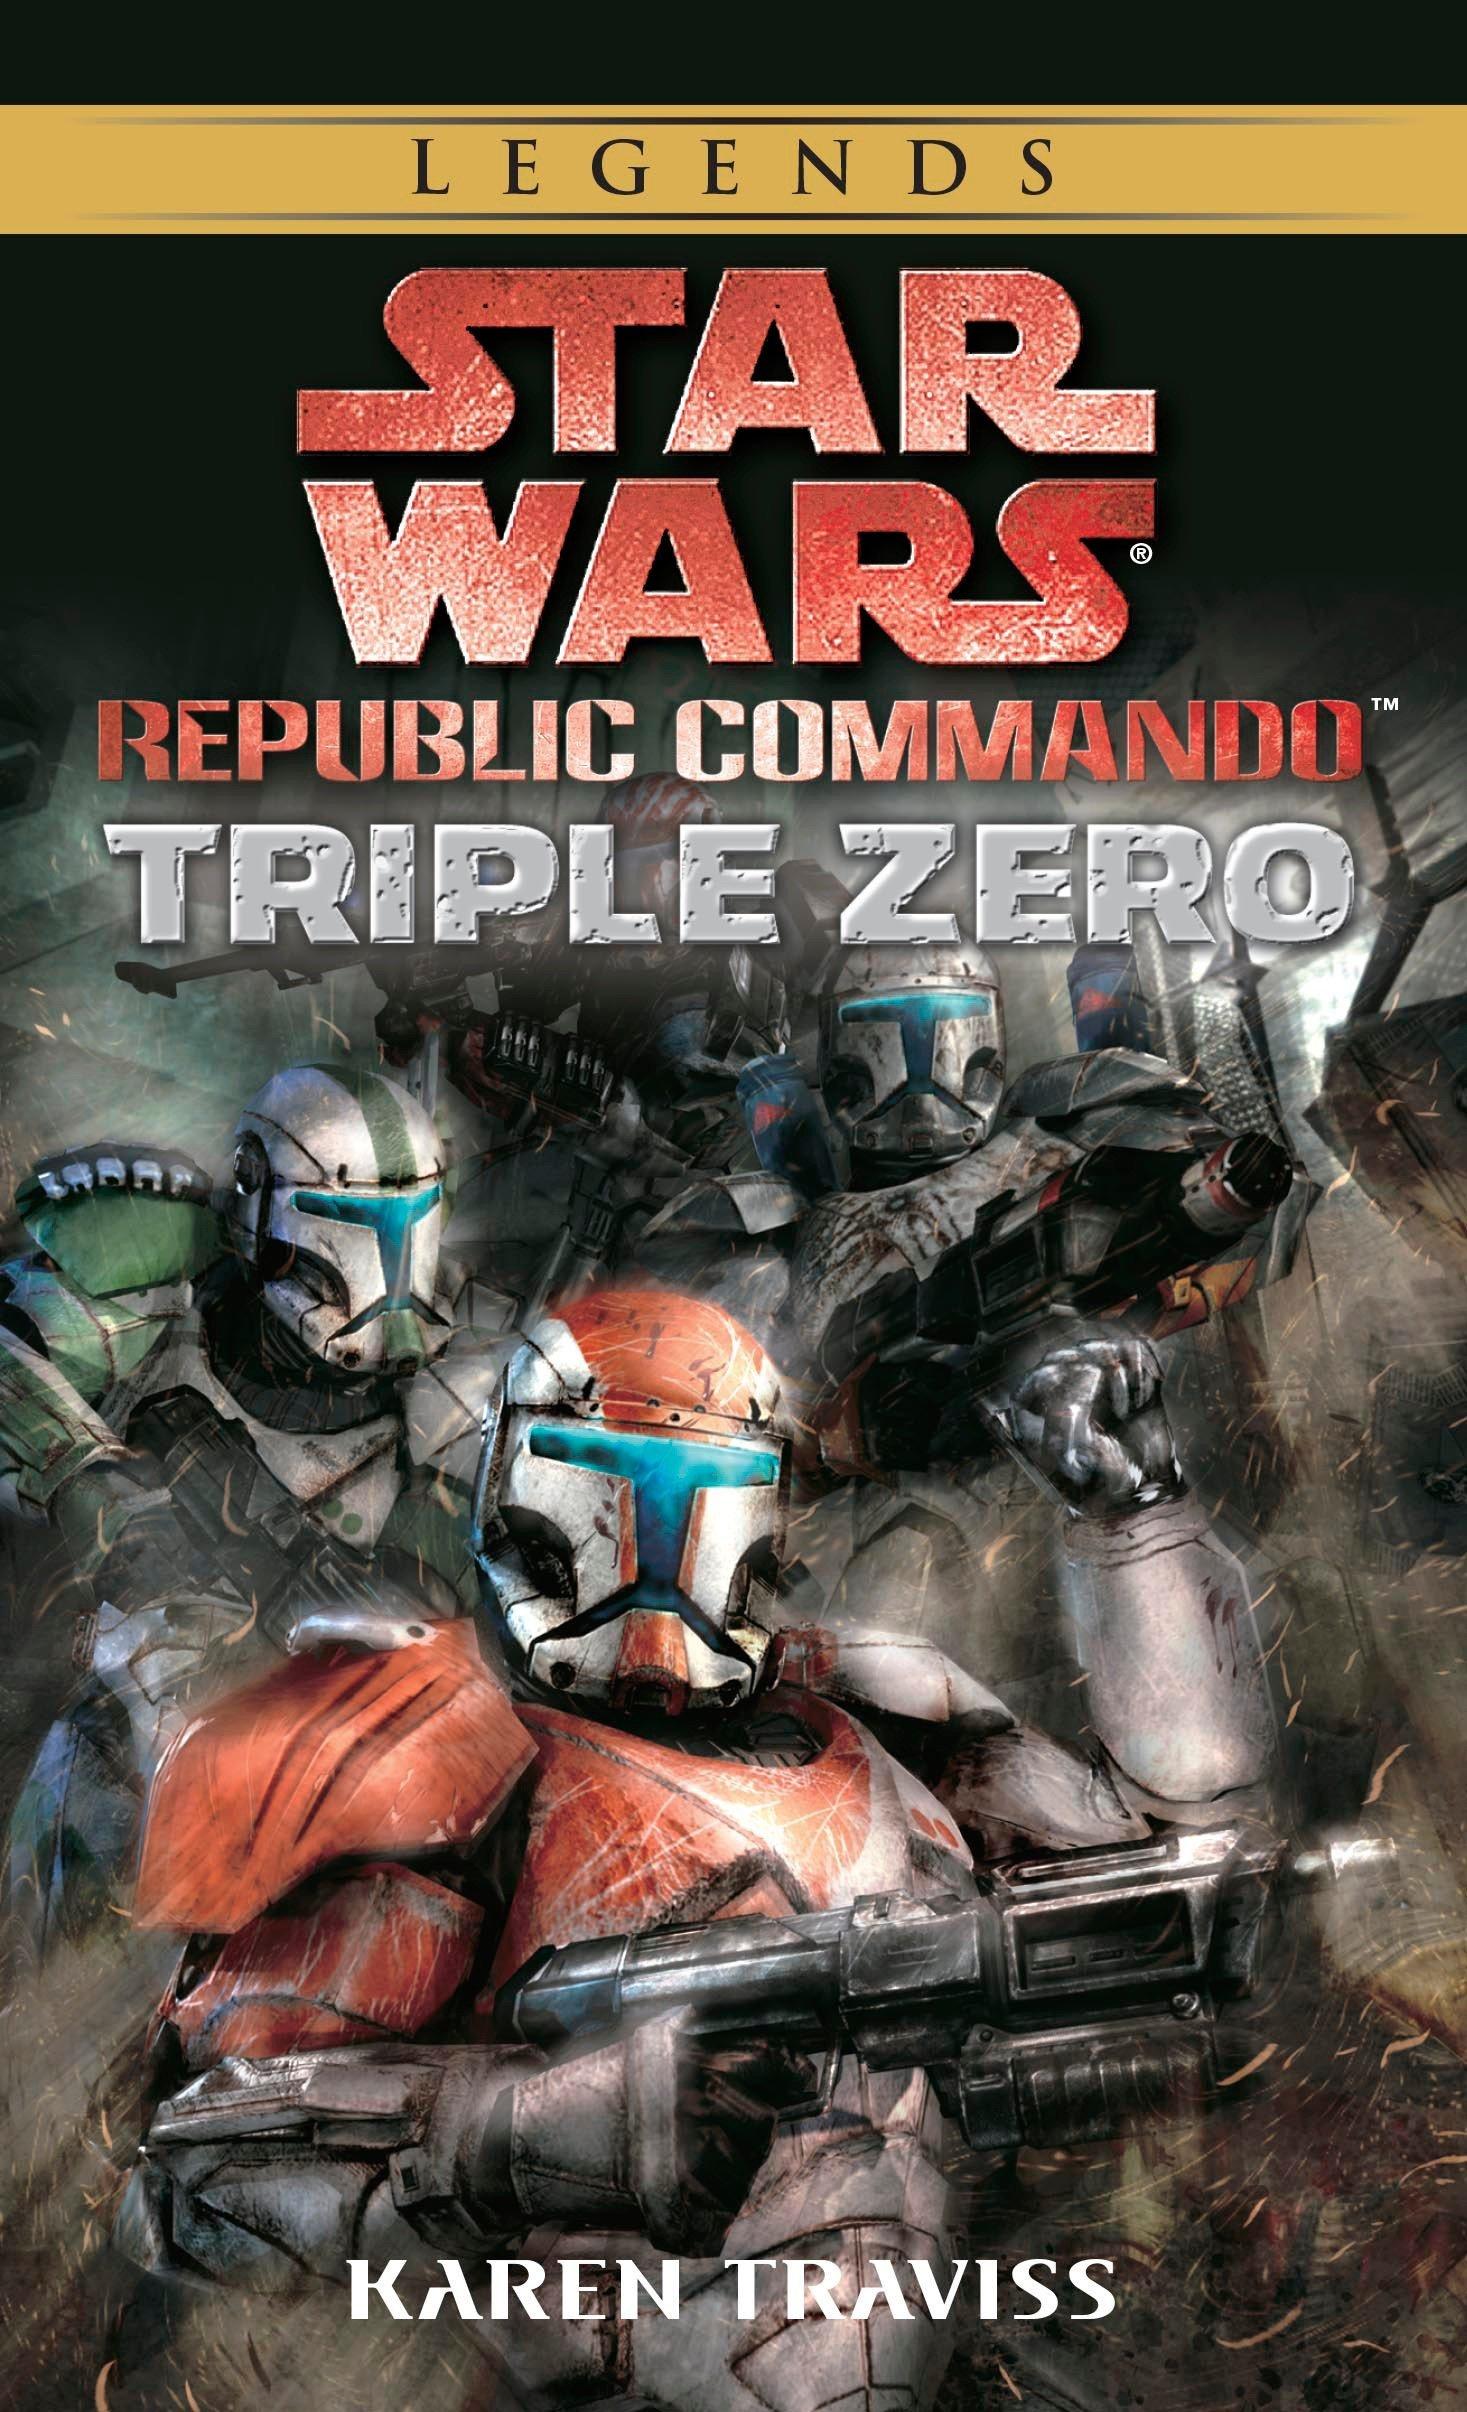 Amazon.com: Triple Zero (Star Wars: Republic Commando, Book 2)  (9780345490094): Traviss, Karen: Books